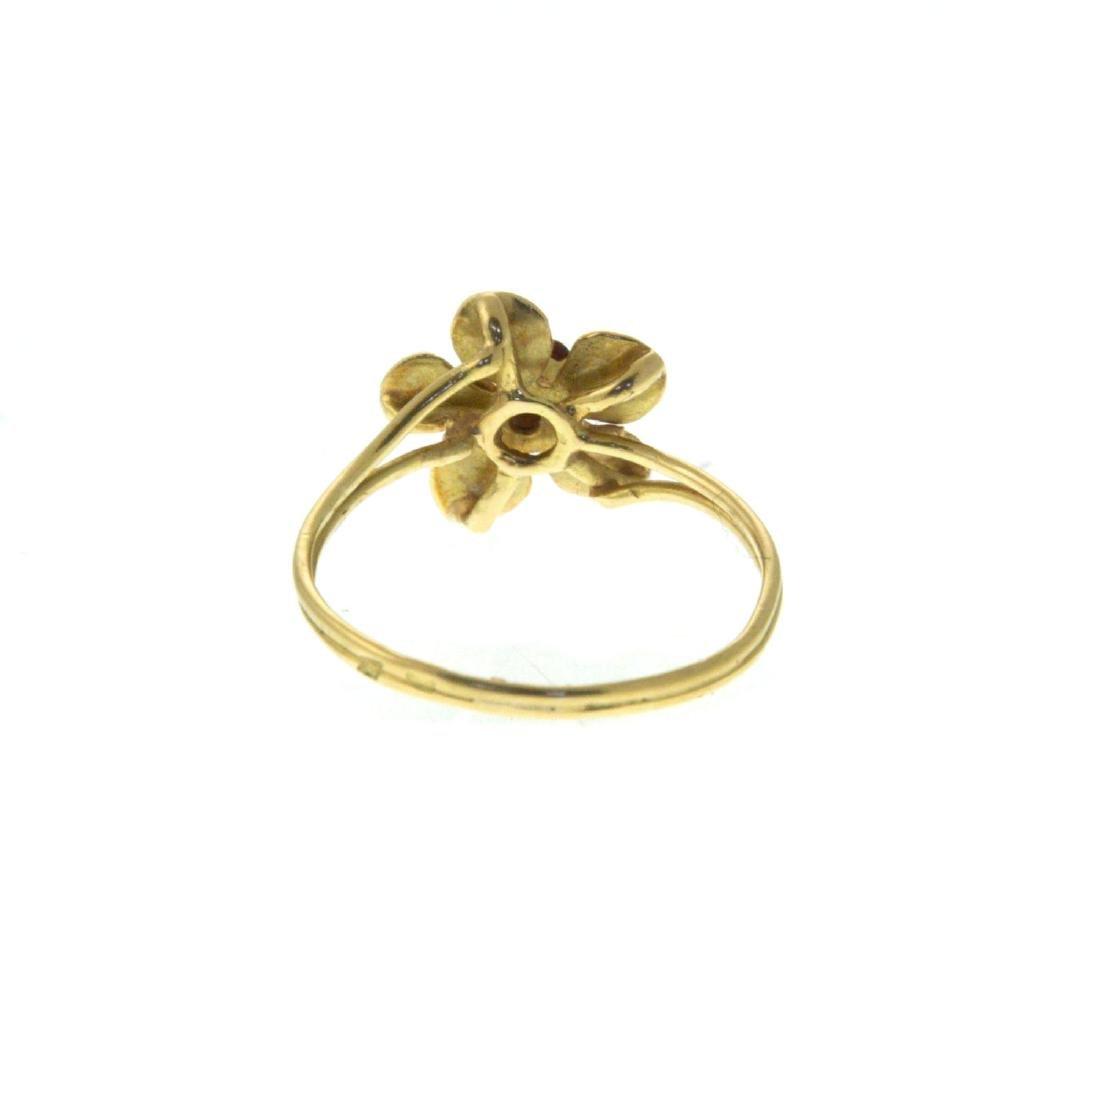 18k Yellow Gold Flower Ring. - 6